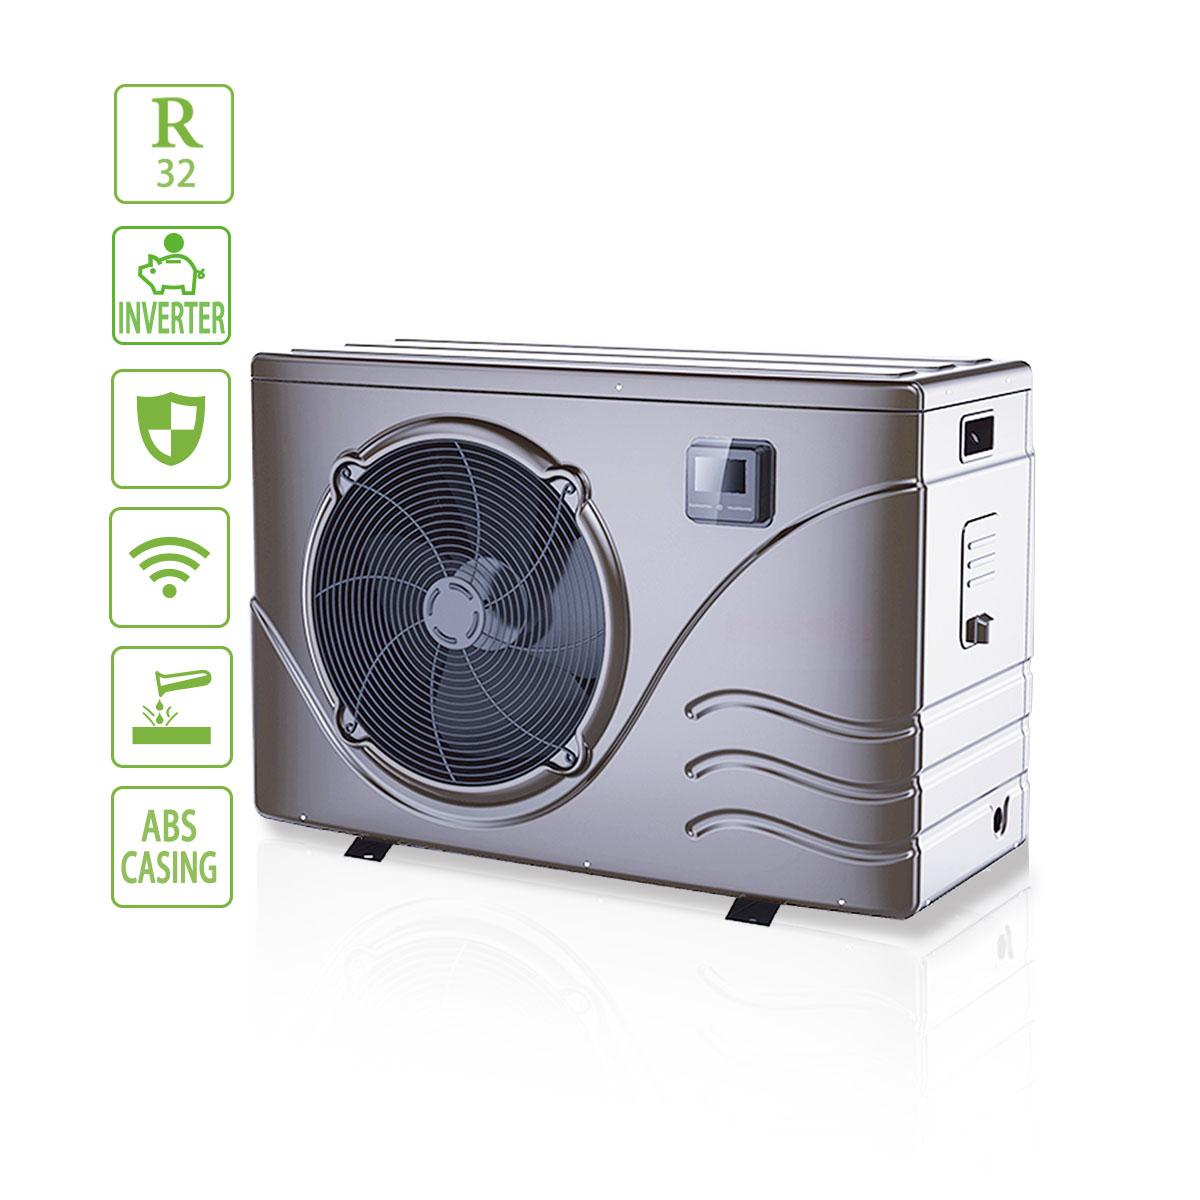 Durable Residential Inverter Swimming Pool Heat Pump